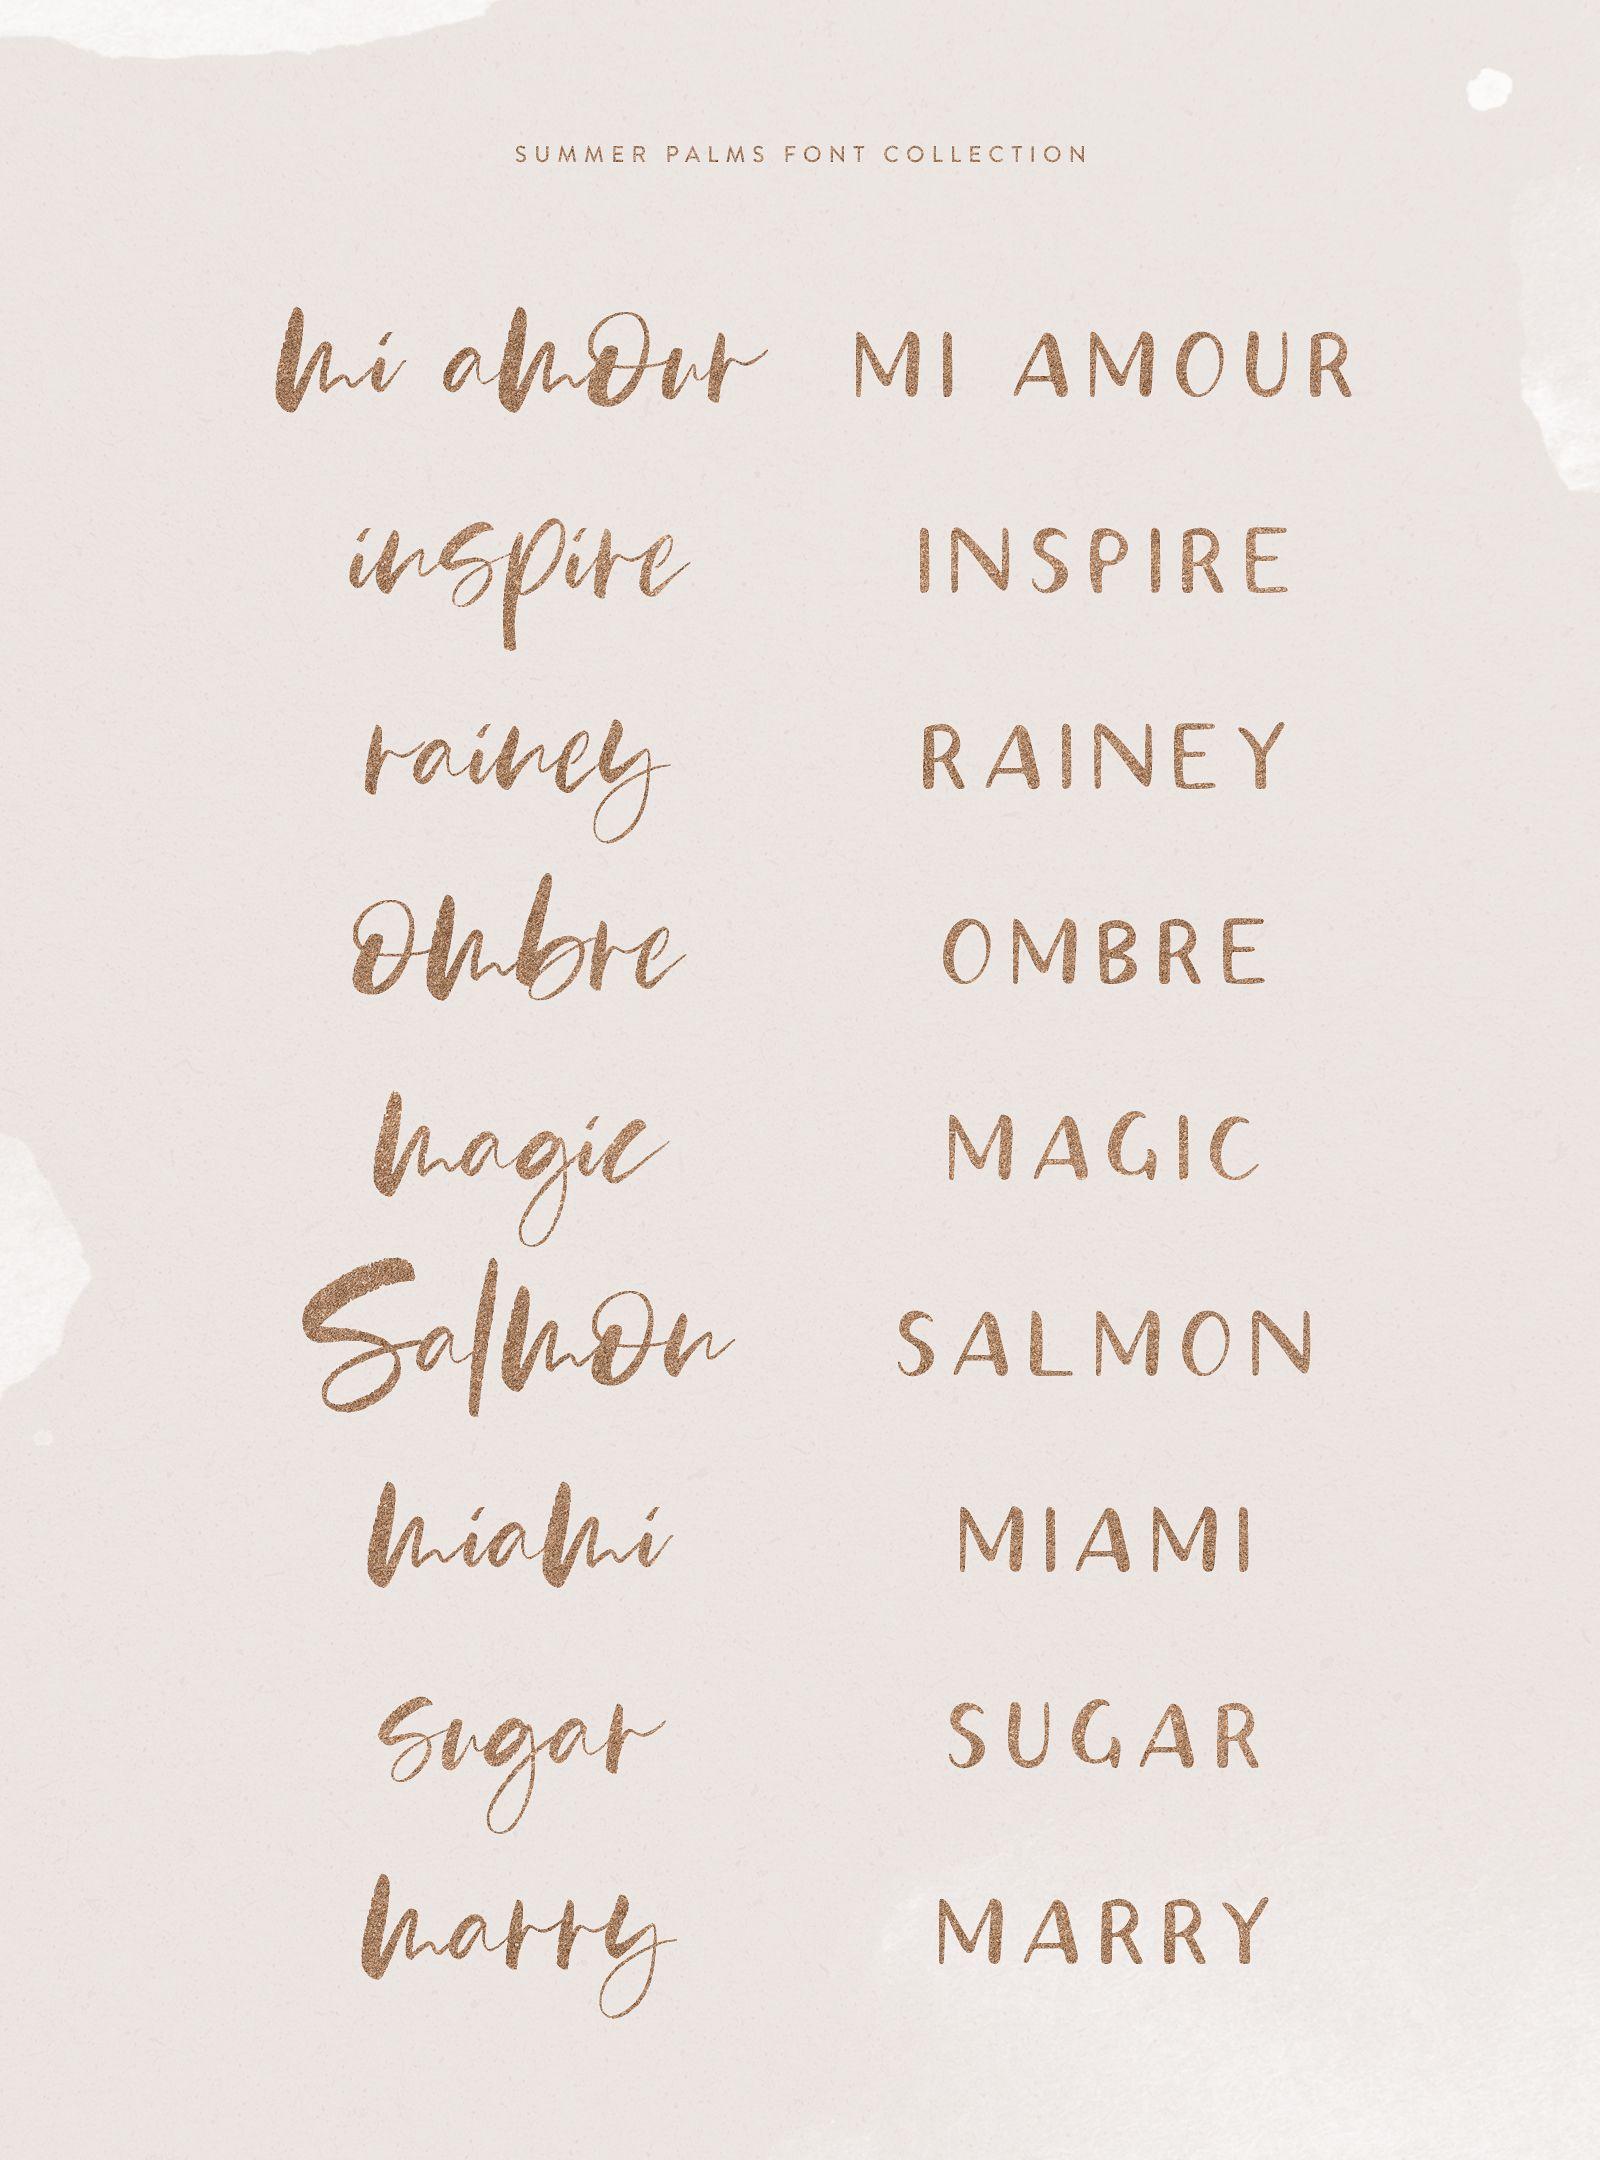 Summer Palms Font Collection Brush Script Hand Lettering Lettering